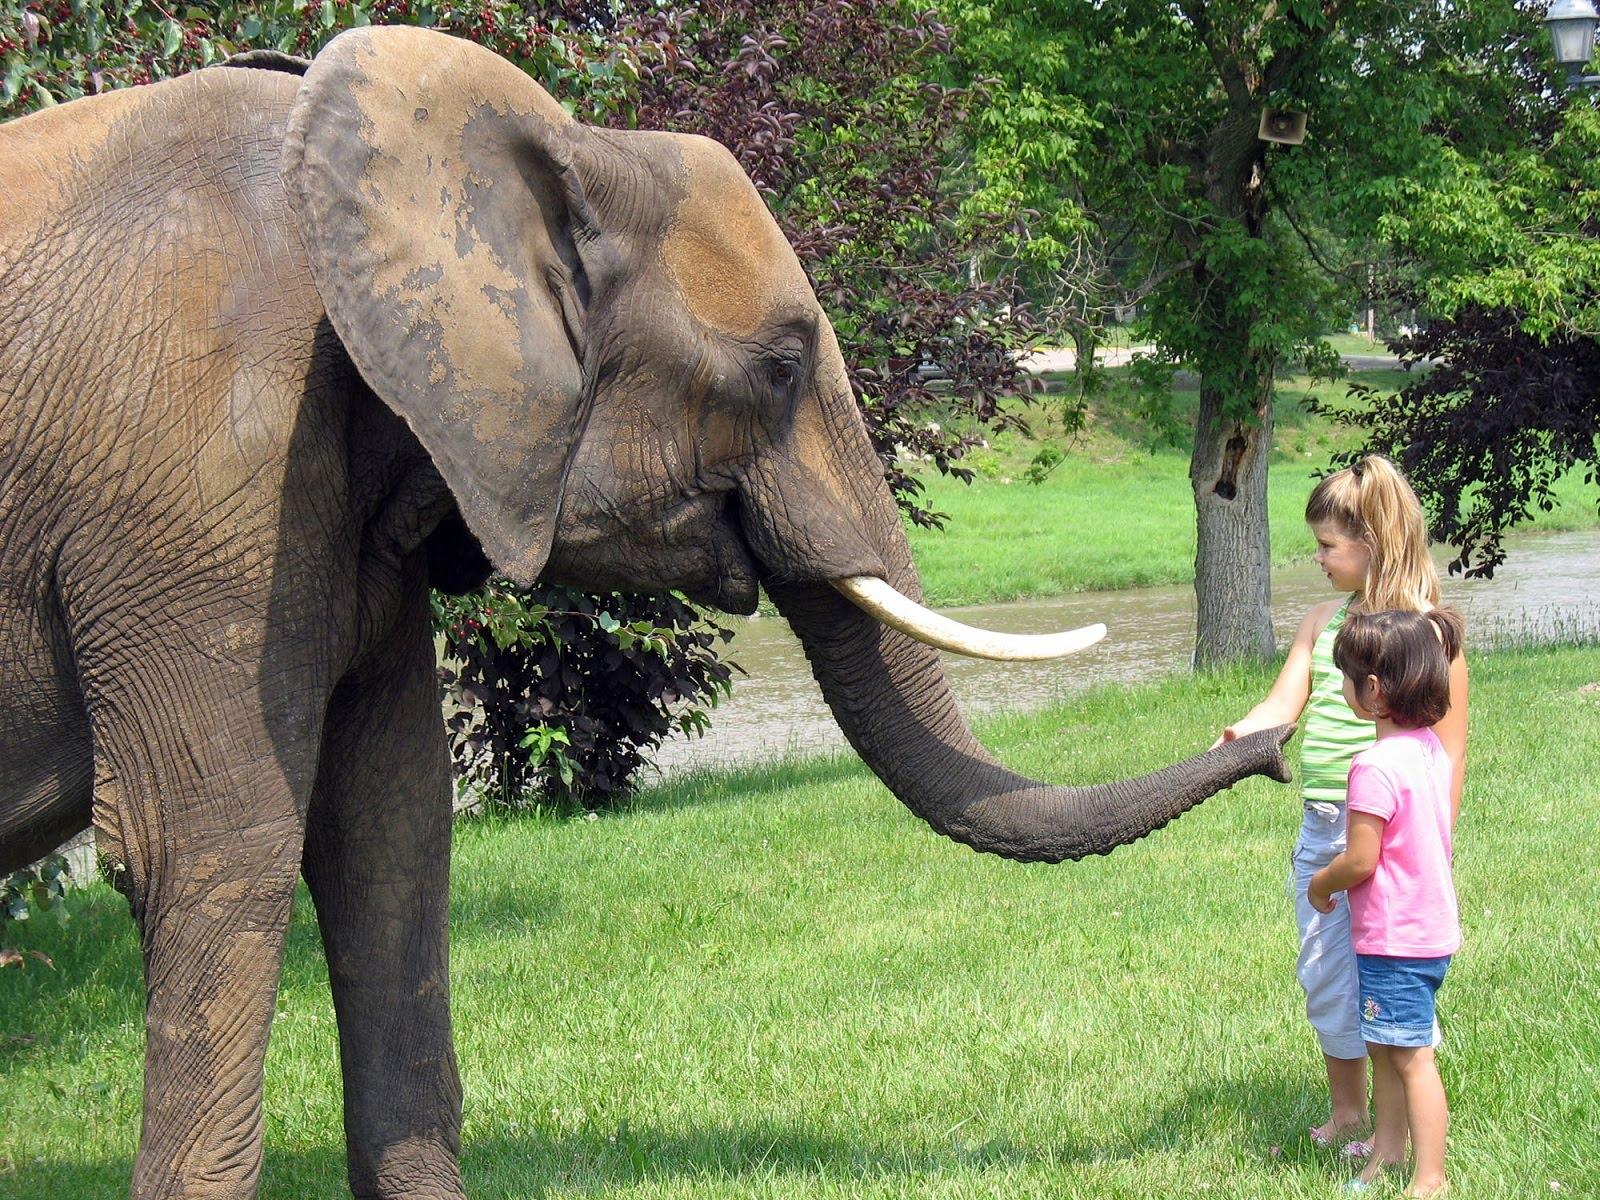 http://1.bp.blogspot.com/-5kjK9w9--mo/Tb2xih17s8I/AAAAAAAAIfc/DPbnzMxB_a4/s1600/elephant-15.jpg